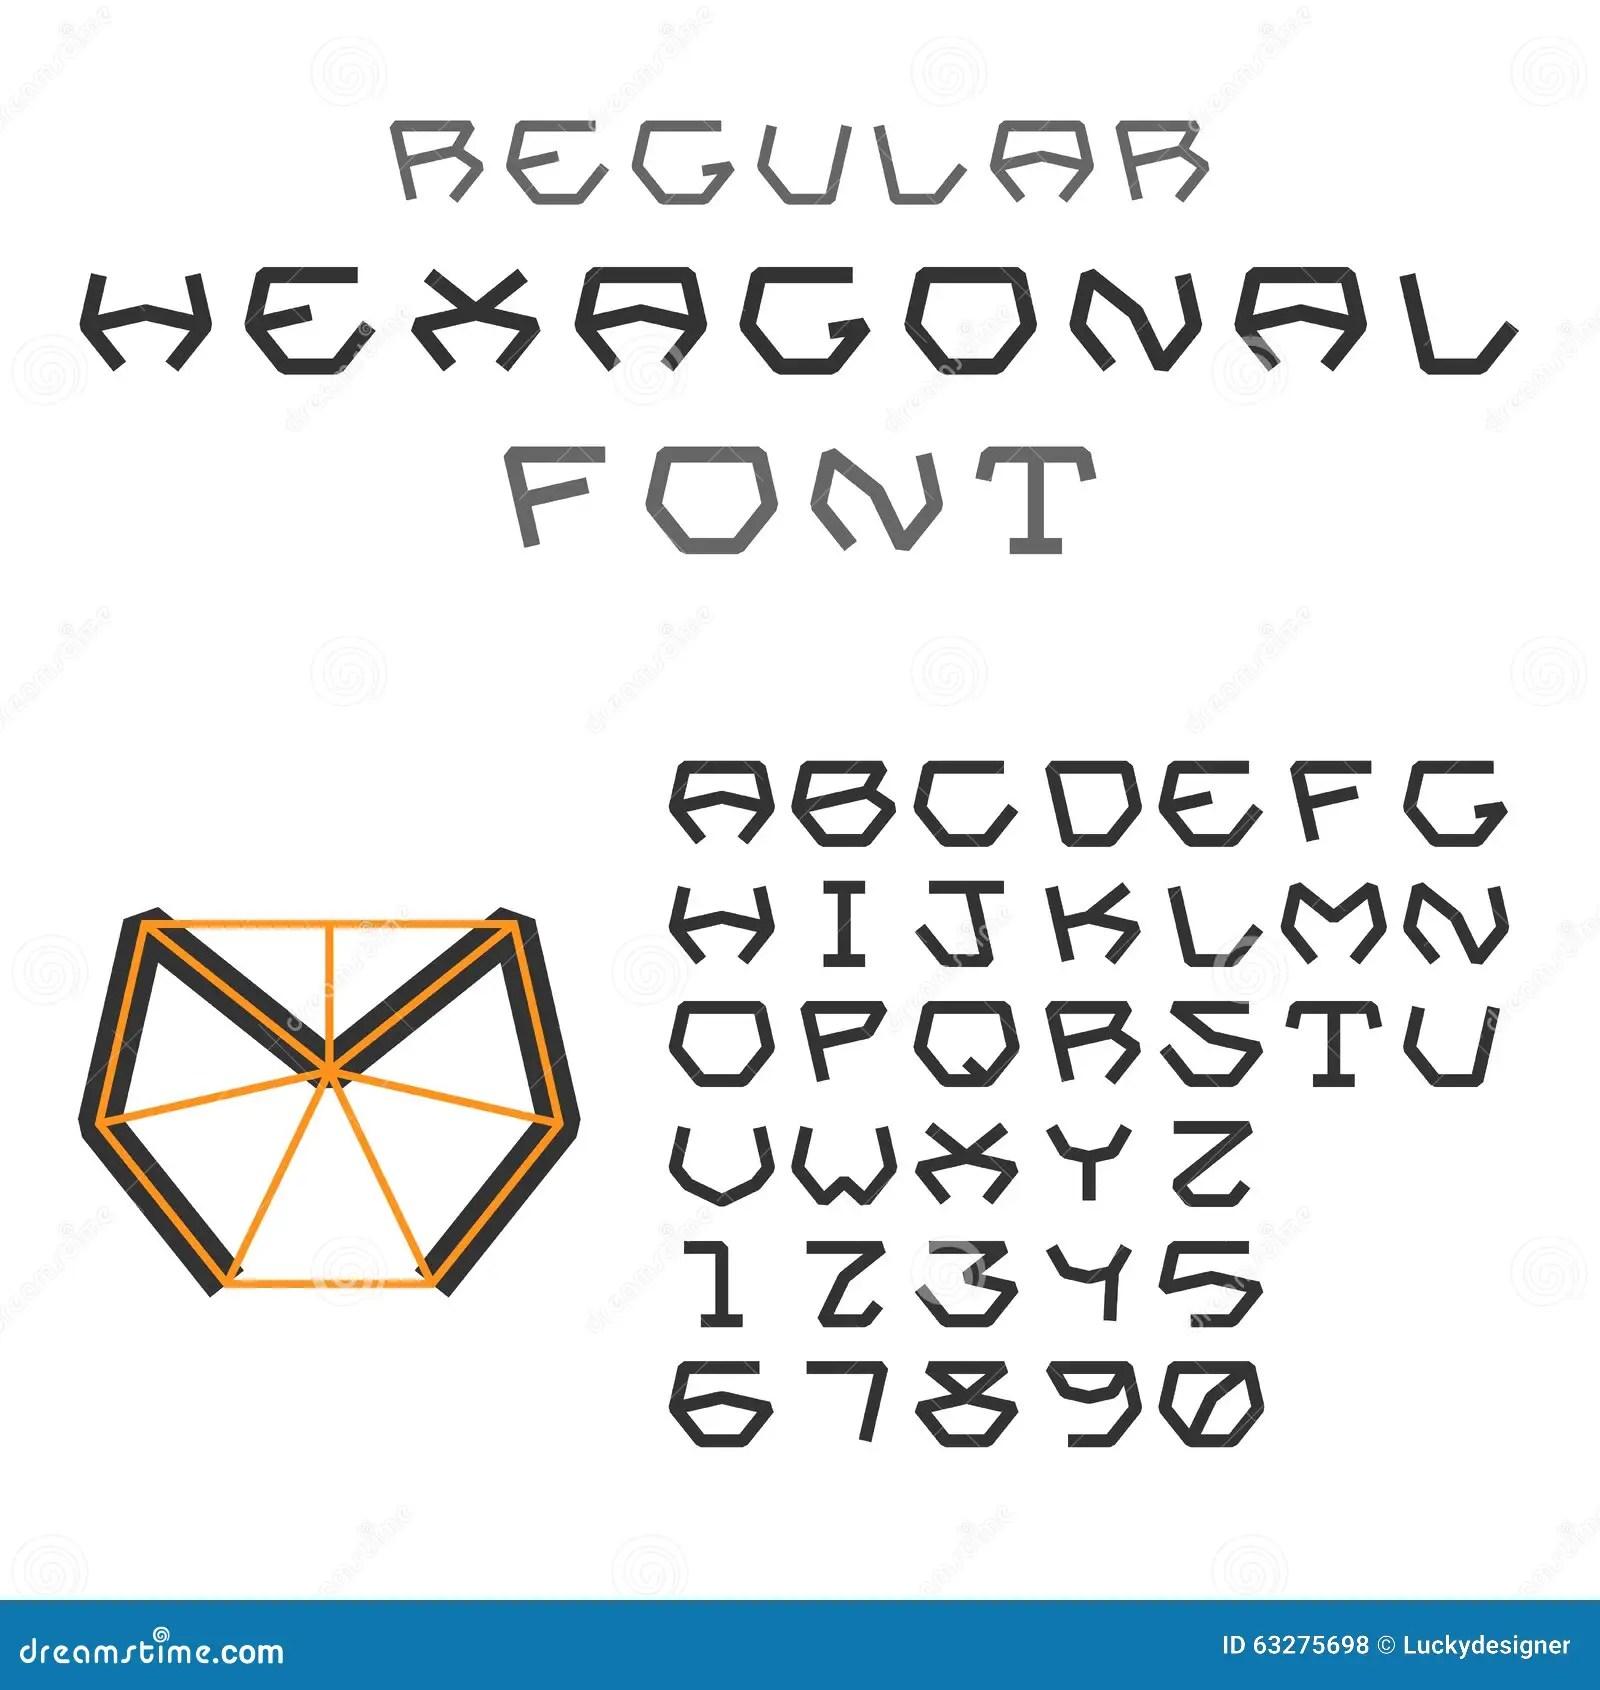 Hexagonal ABC. Geometric Font. Letters And Digits. Regular